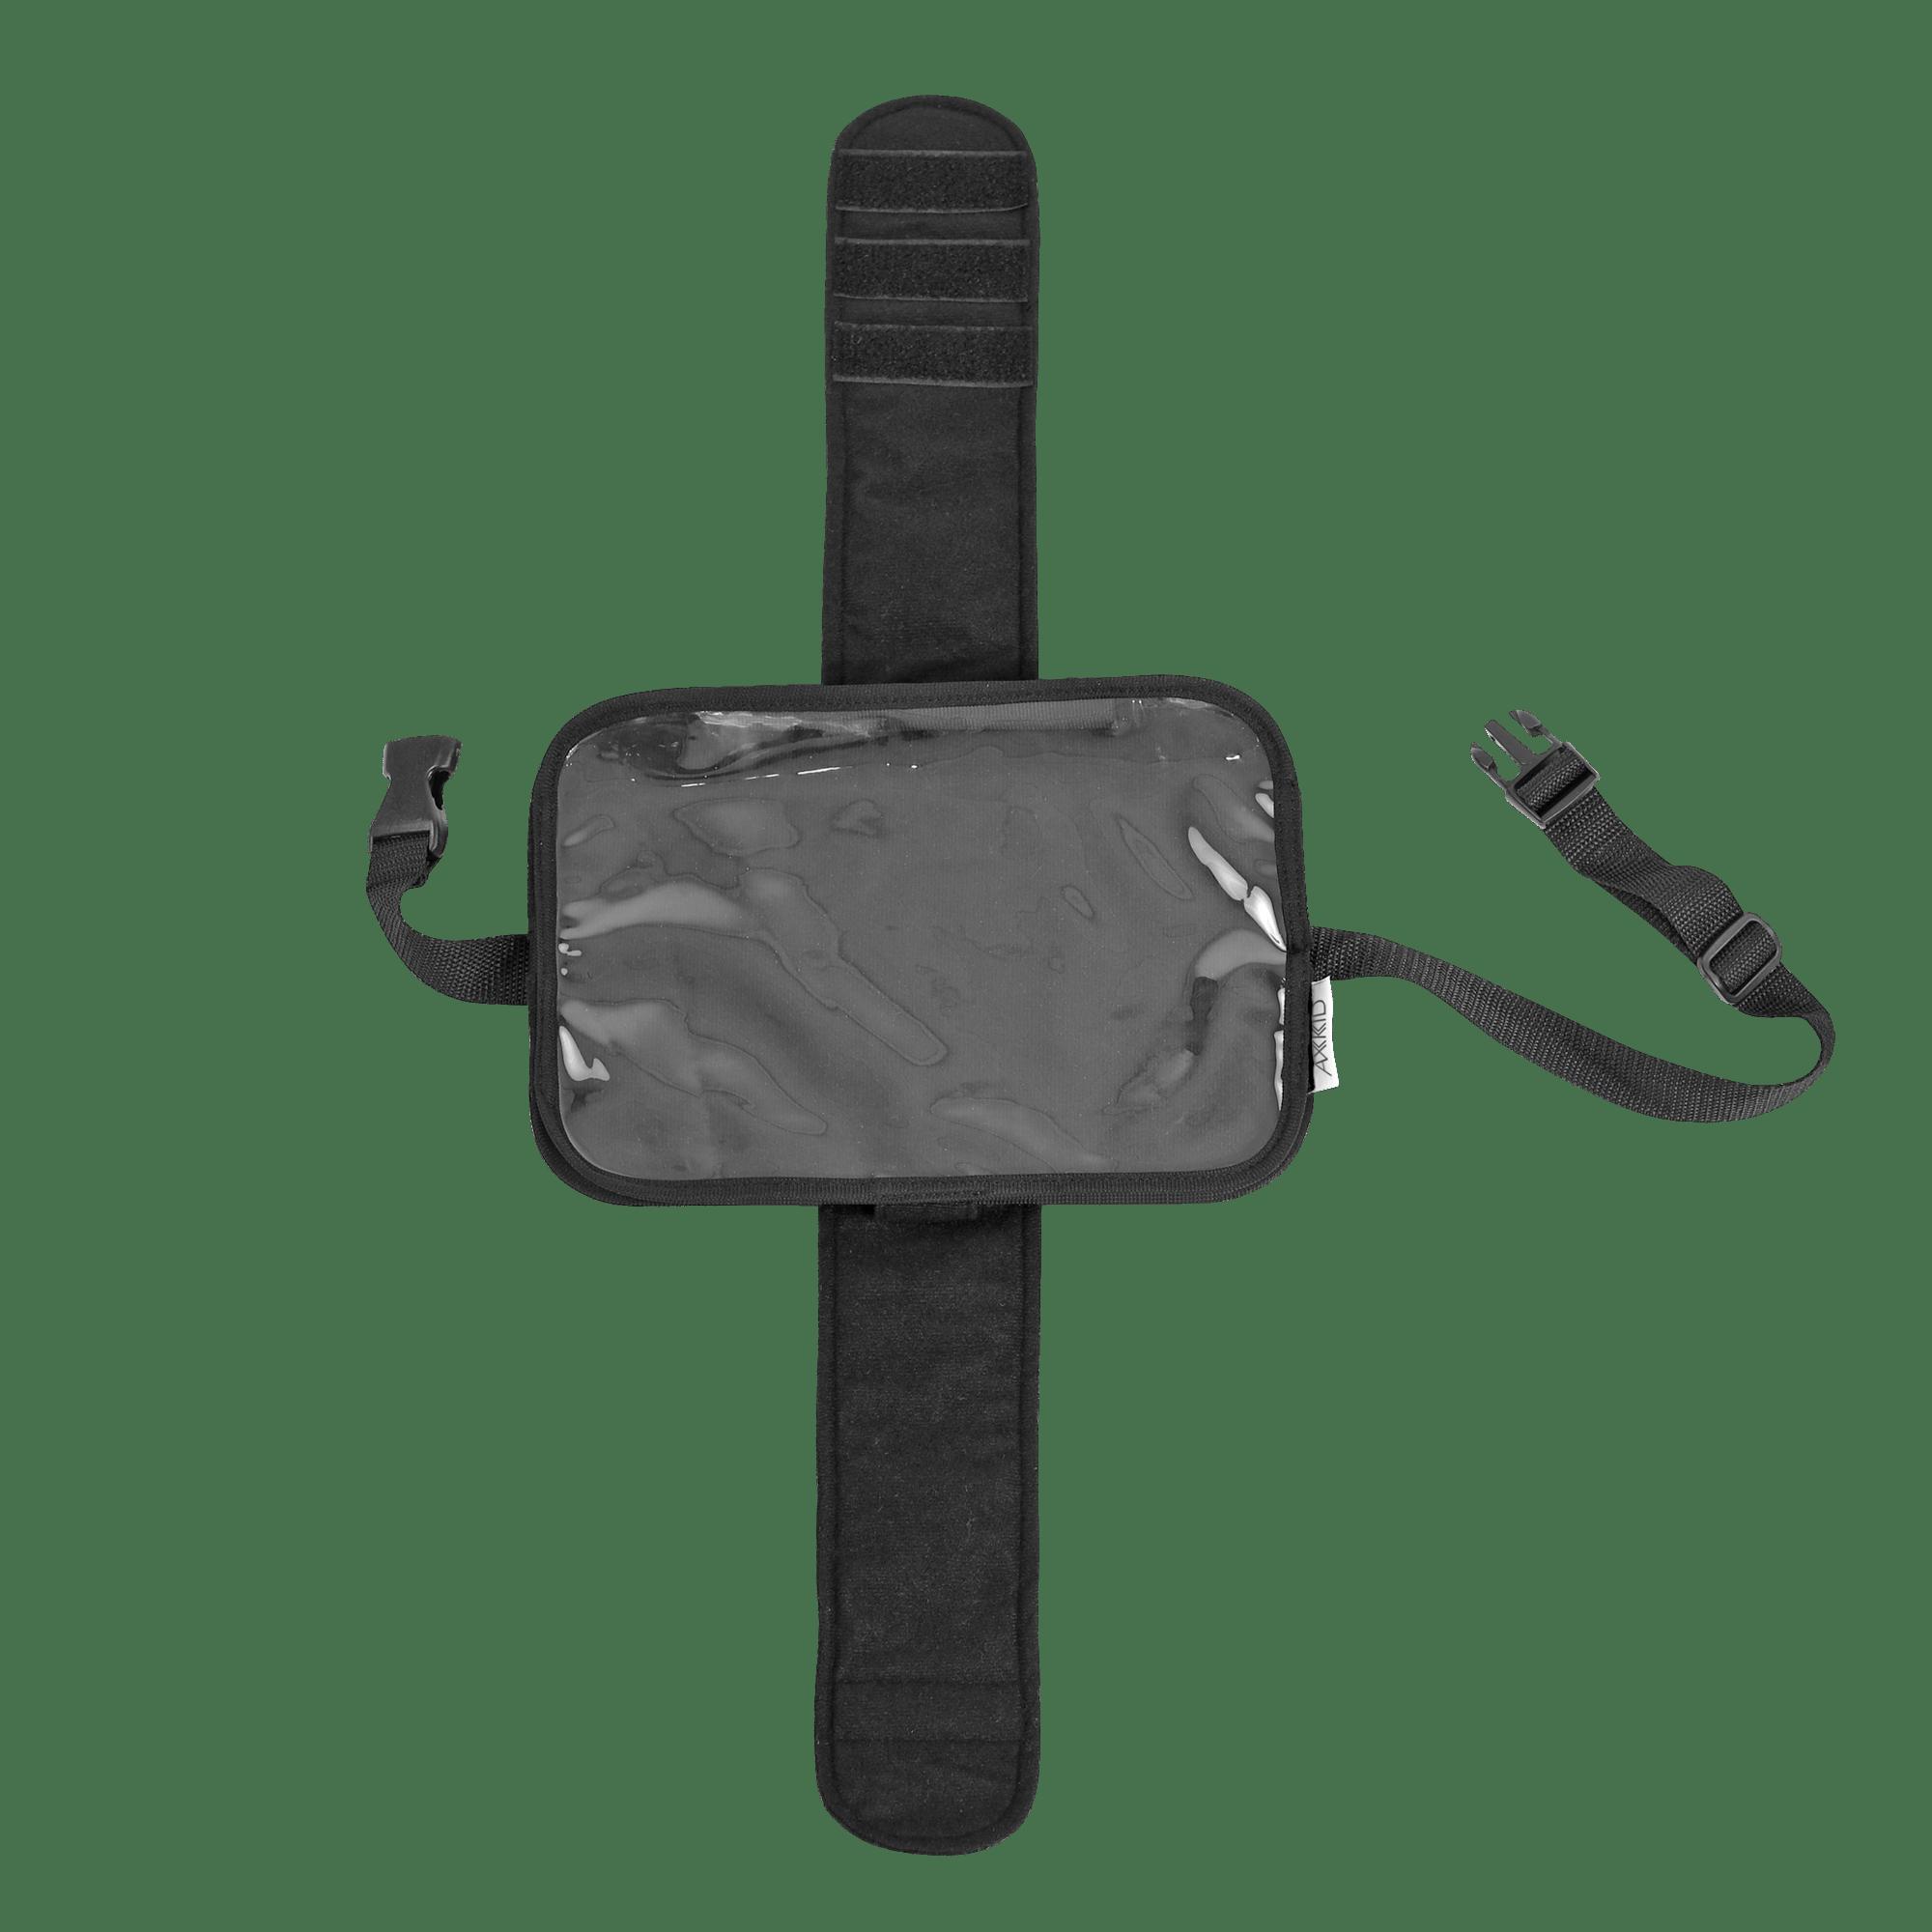 Axkid iPad holder